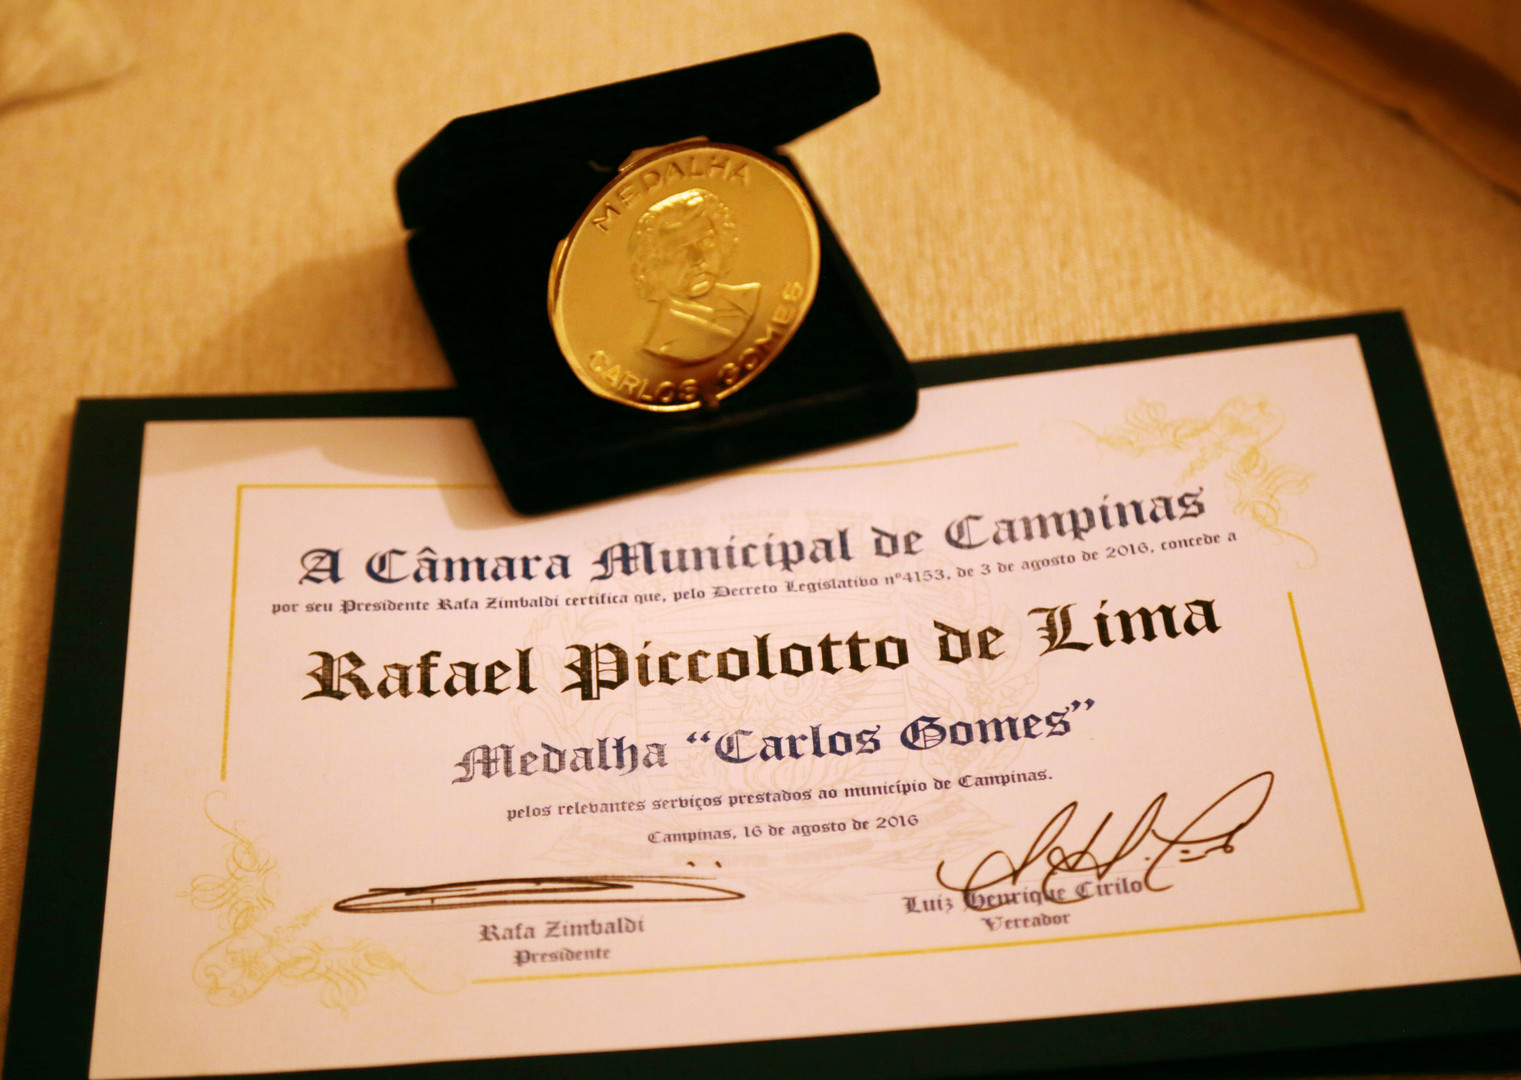 medalha e diploma carlos gomes.jpg